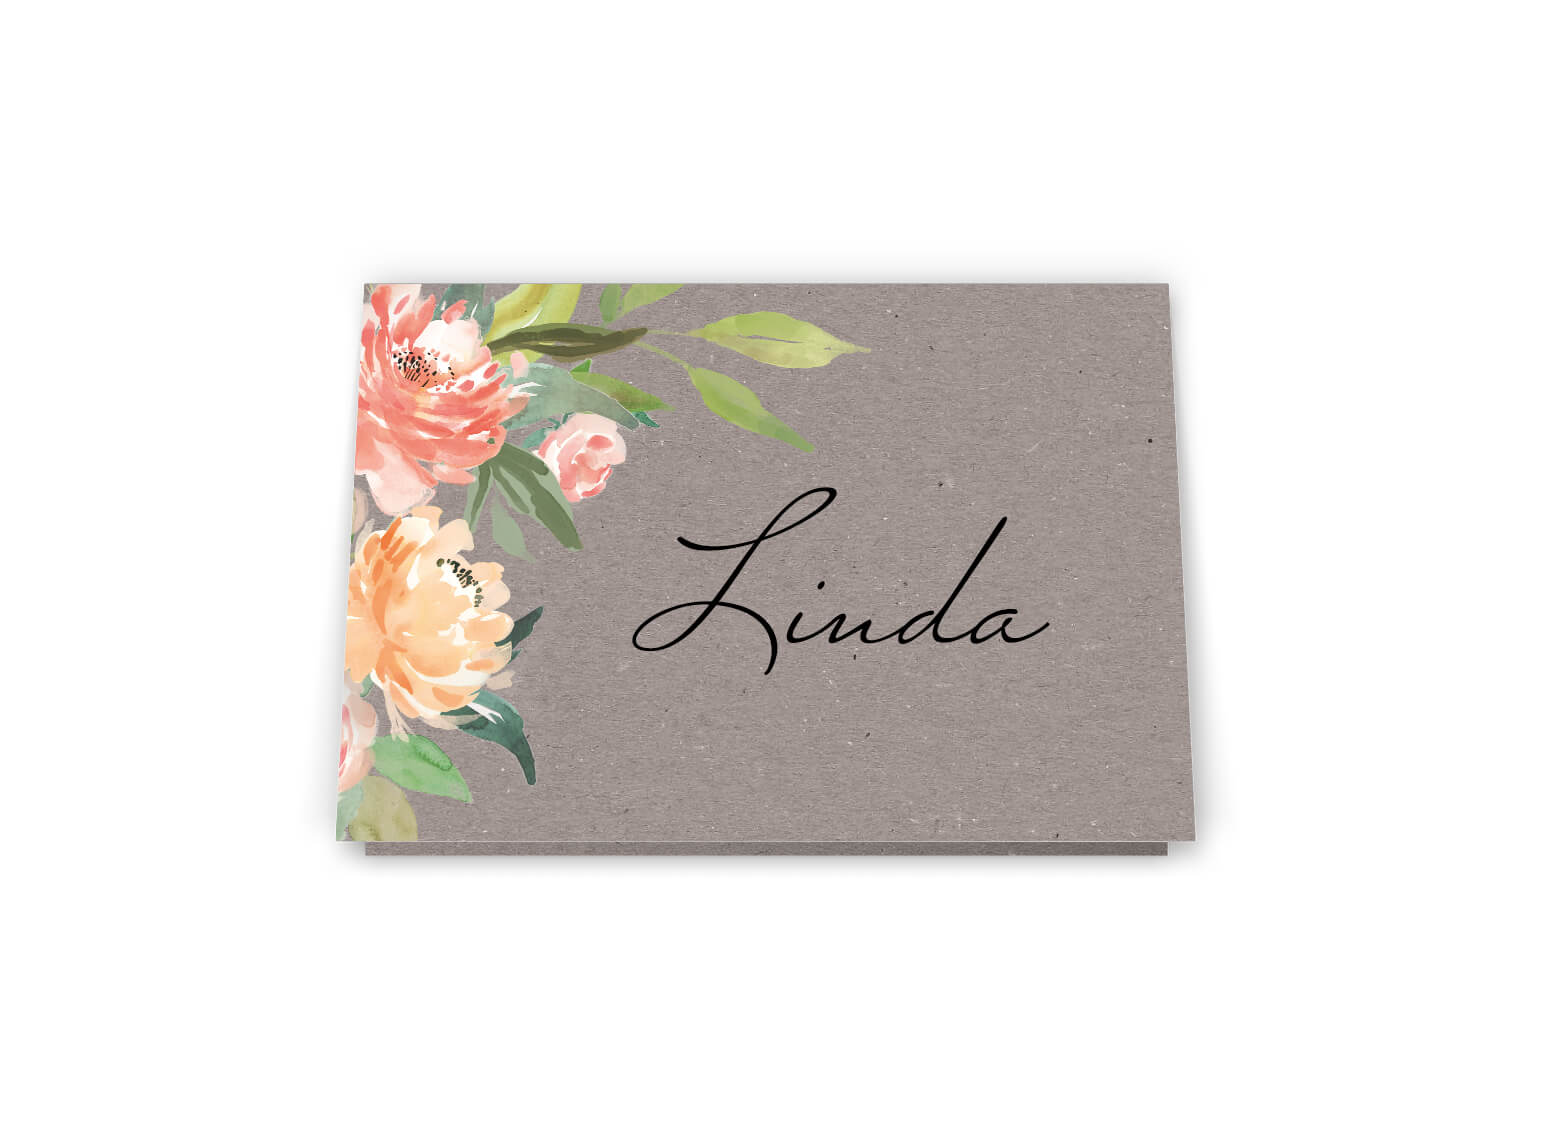 Platzkarten Hochzeit Namenschild